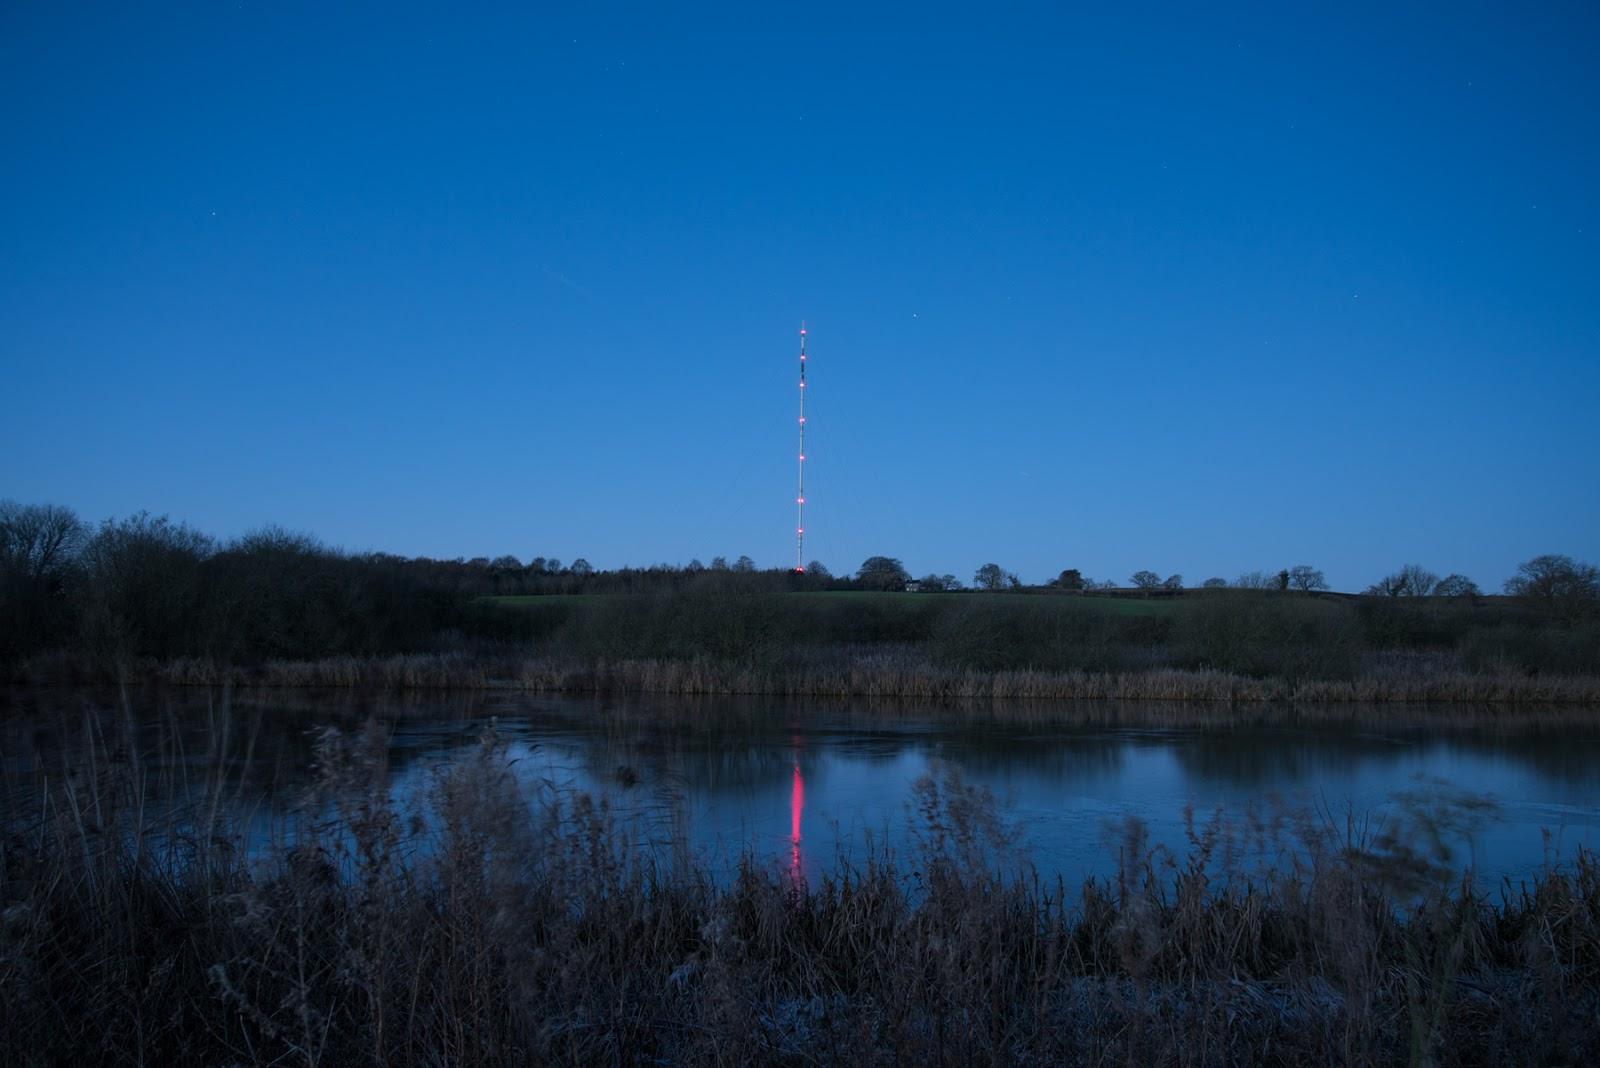 Belmont Transmitter at sunrise